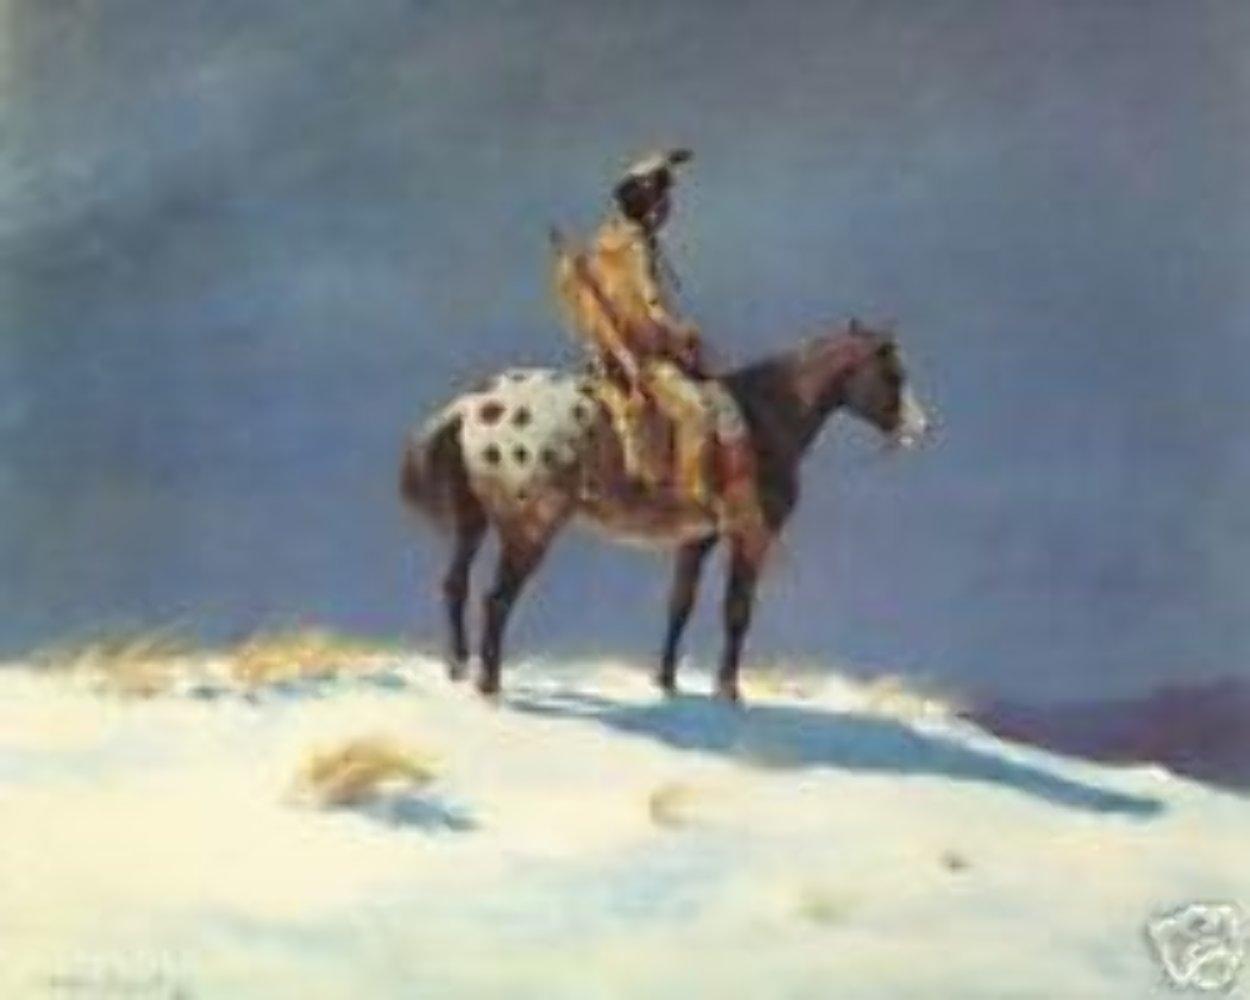 Nez Perce on Appaloosa 1950 (Early) Limited Edition Print by Olaf Wieghorst